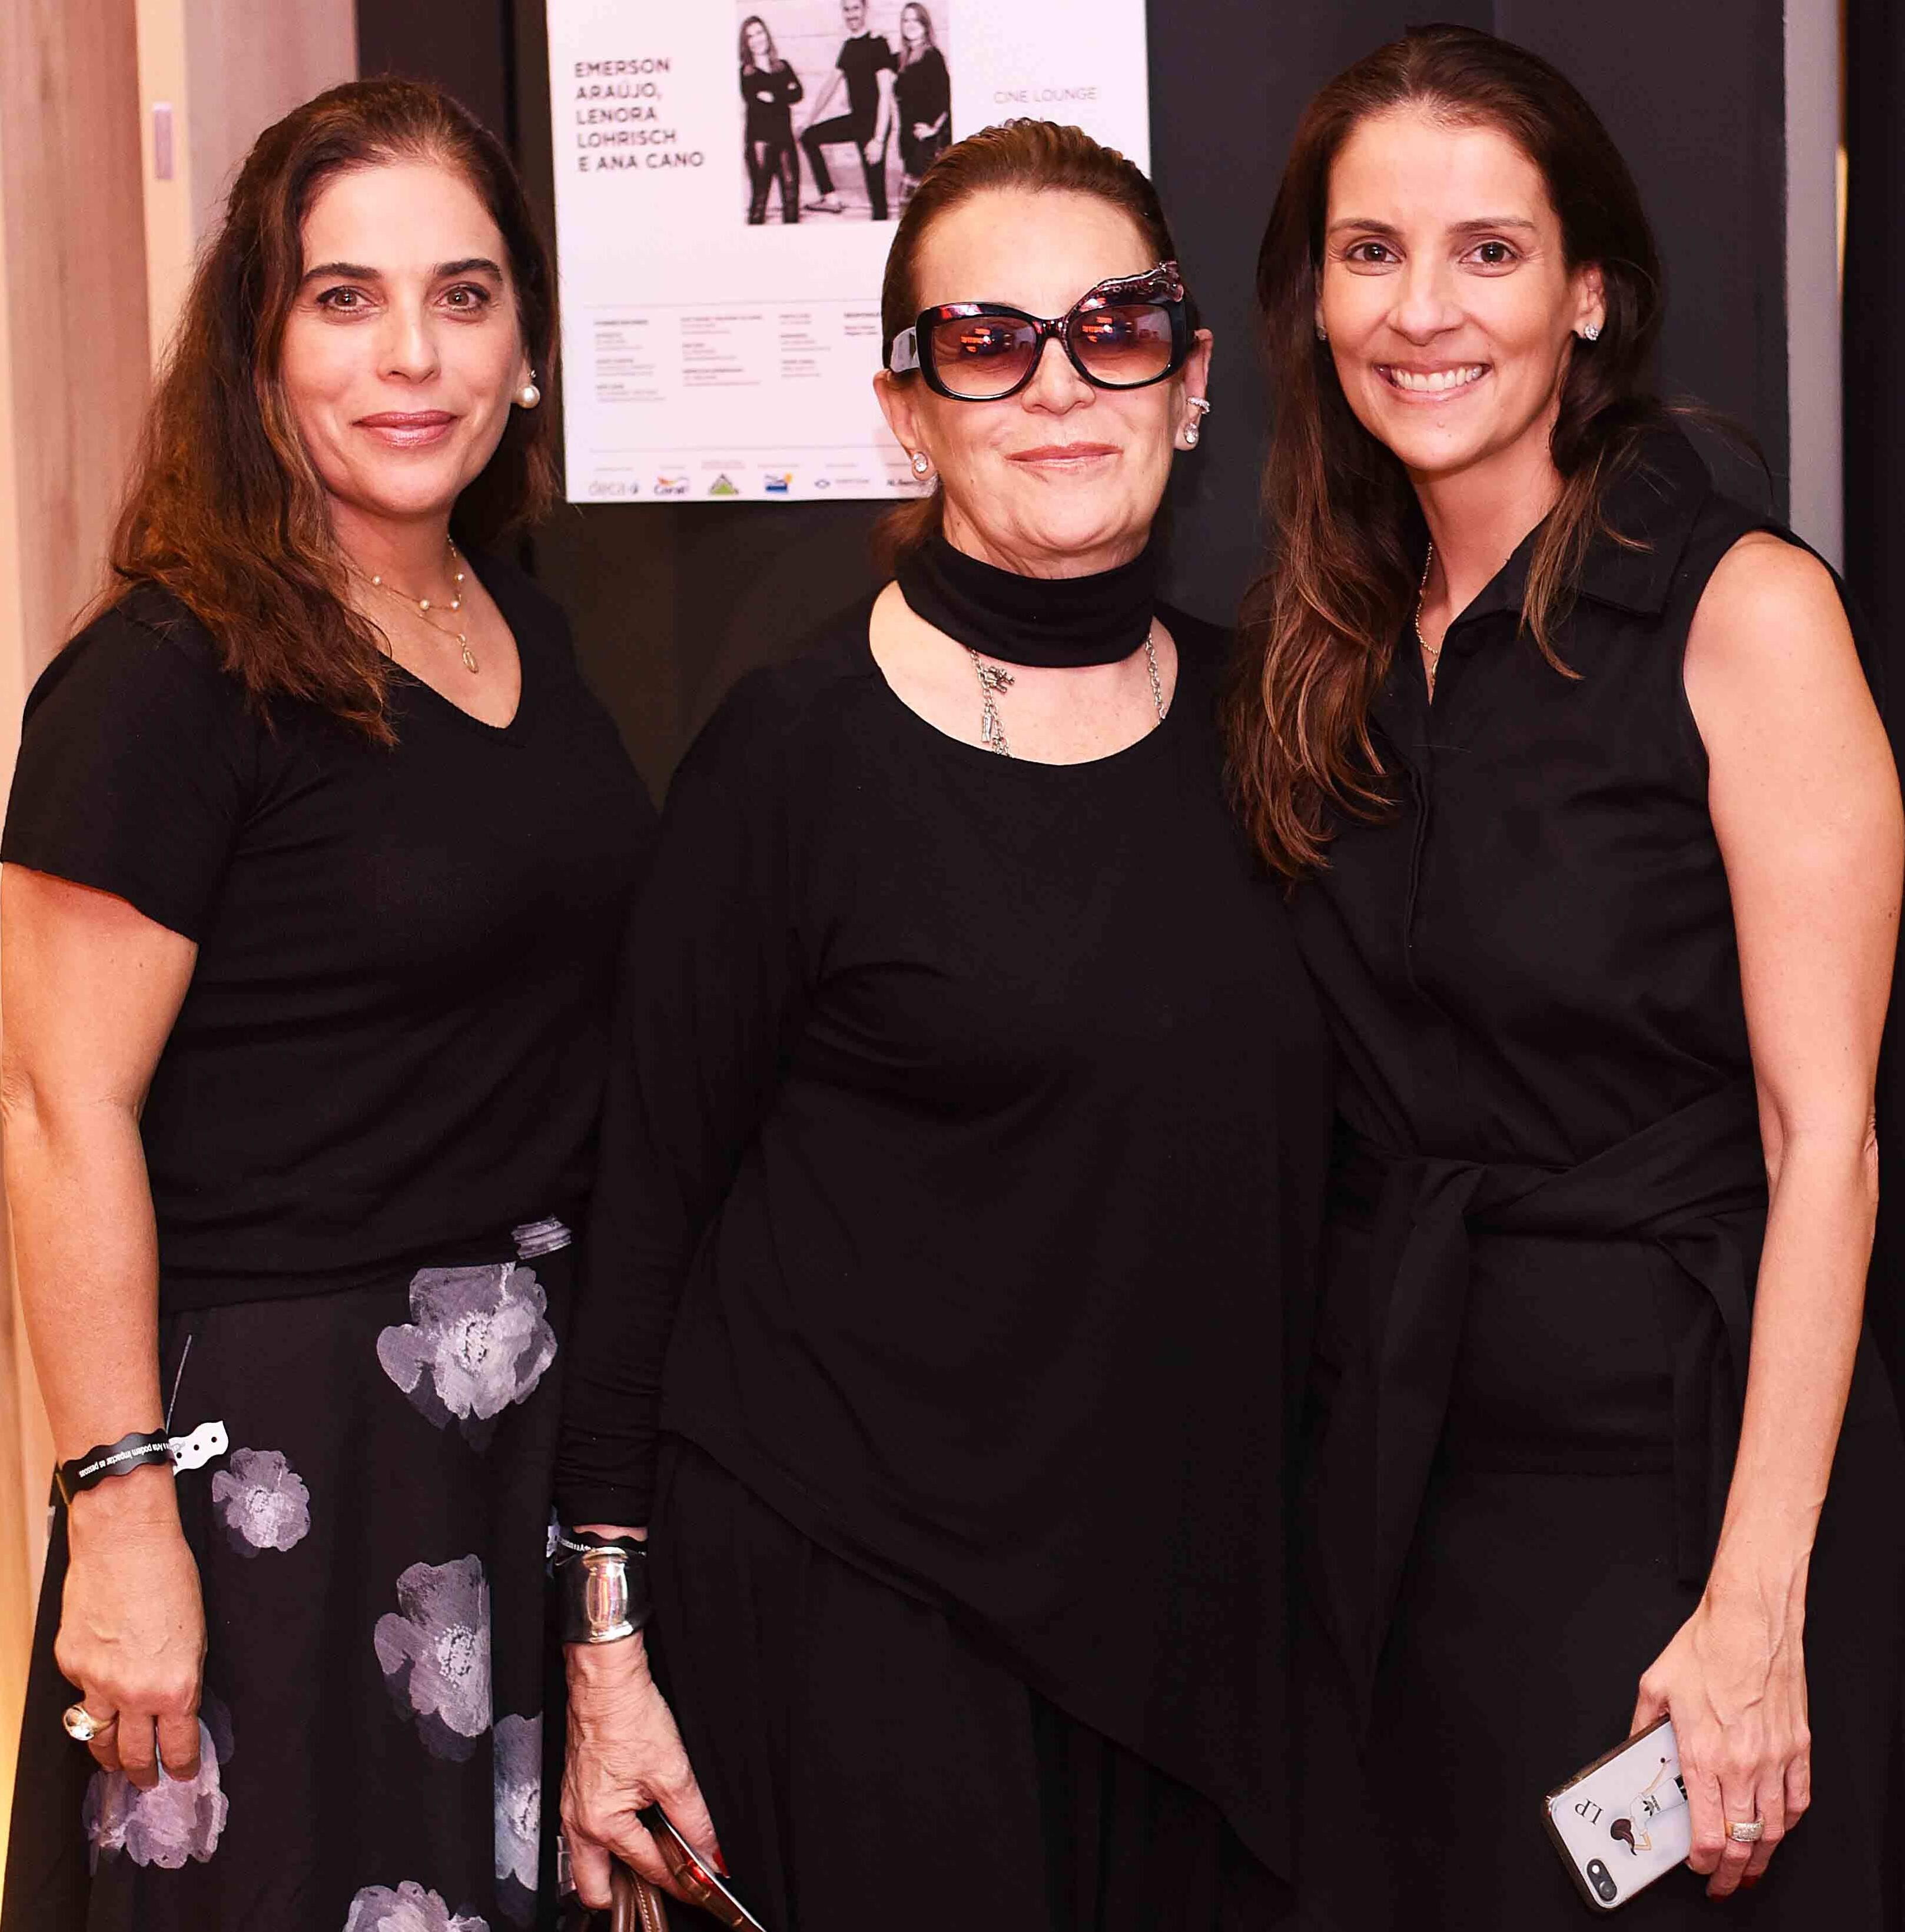 Rossiane Correa, Fatima Martins e Laura Paes /Foto: Ari Kaye